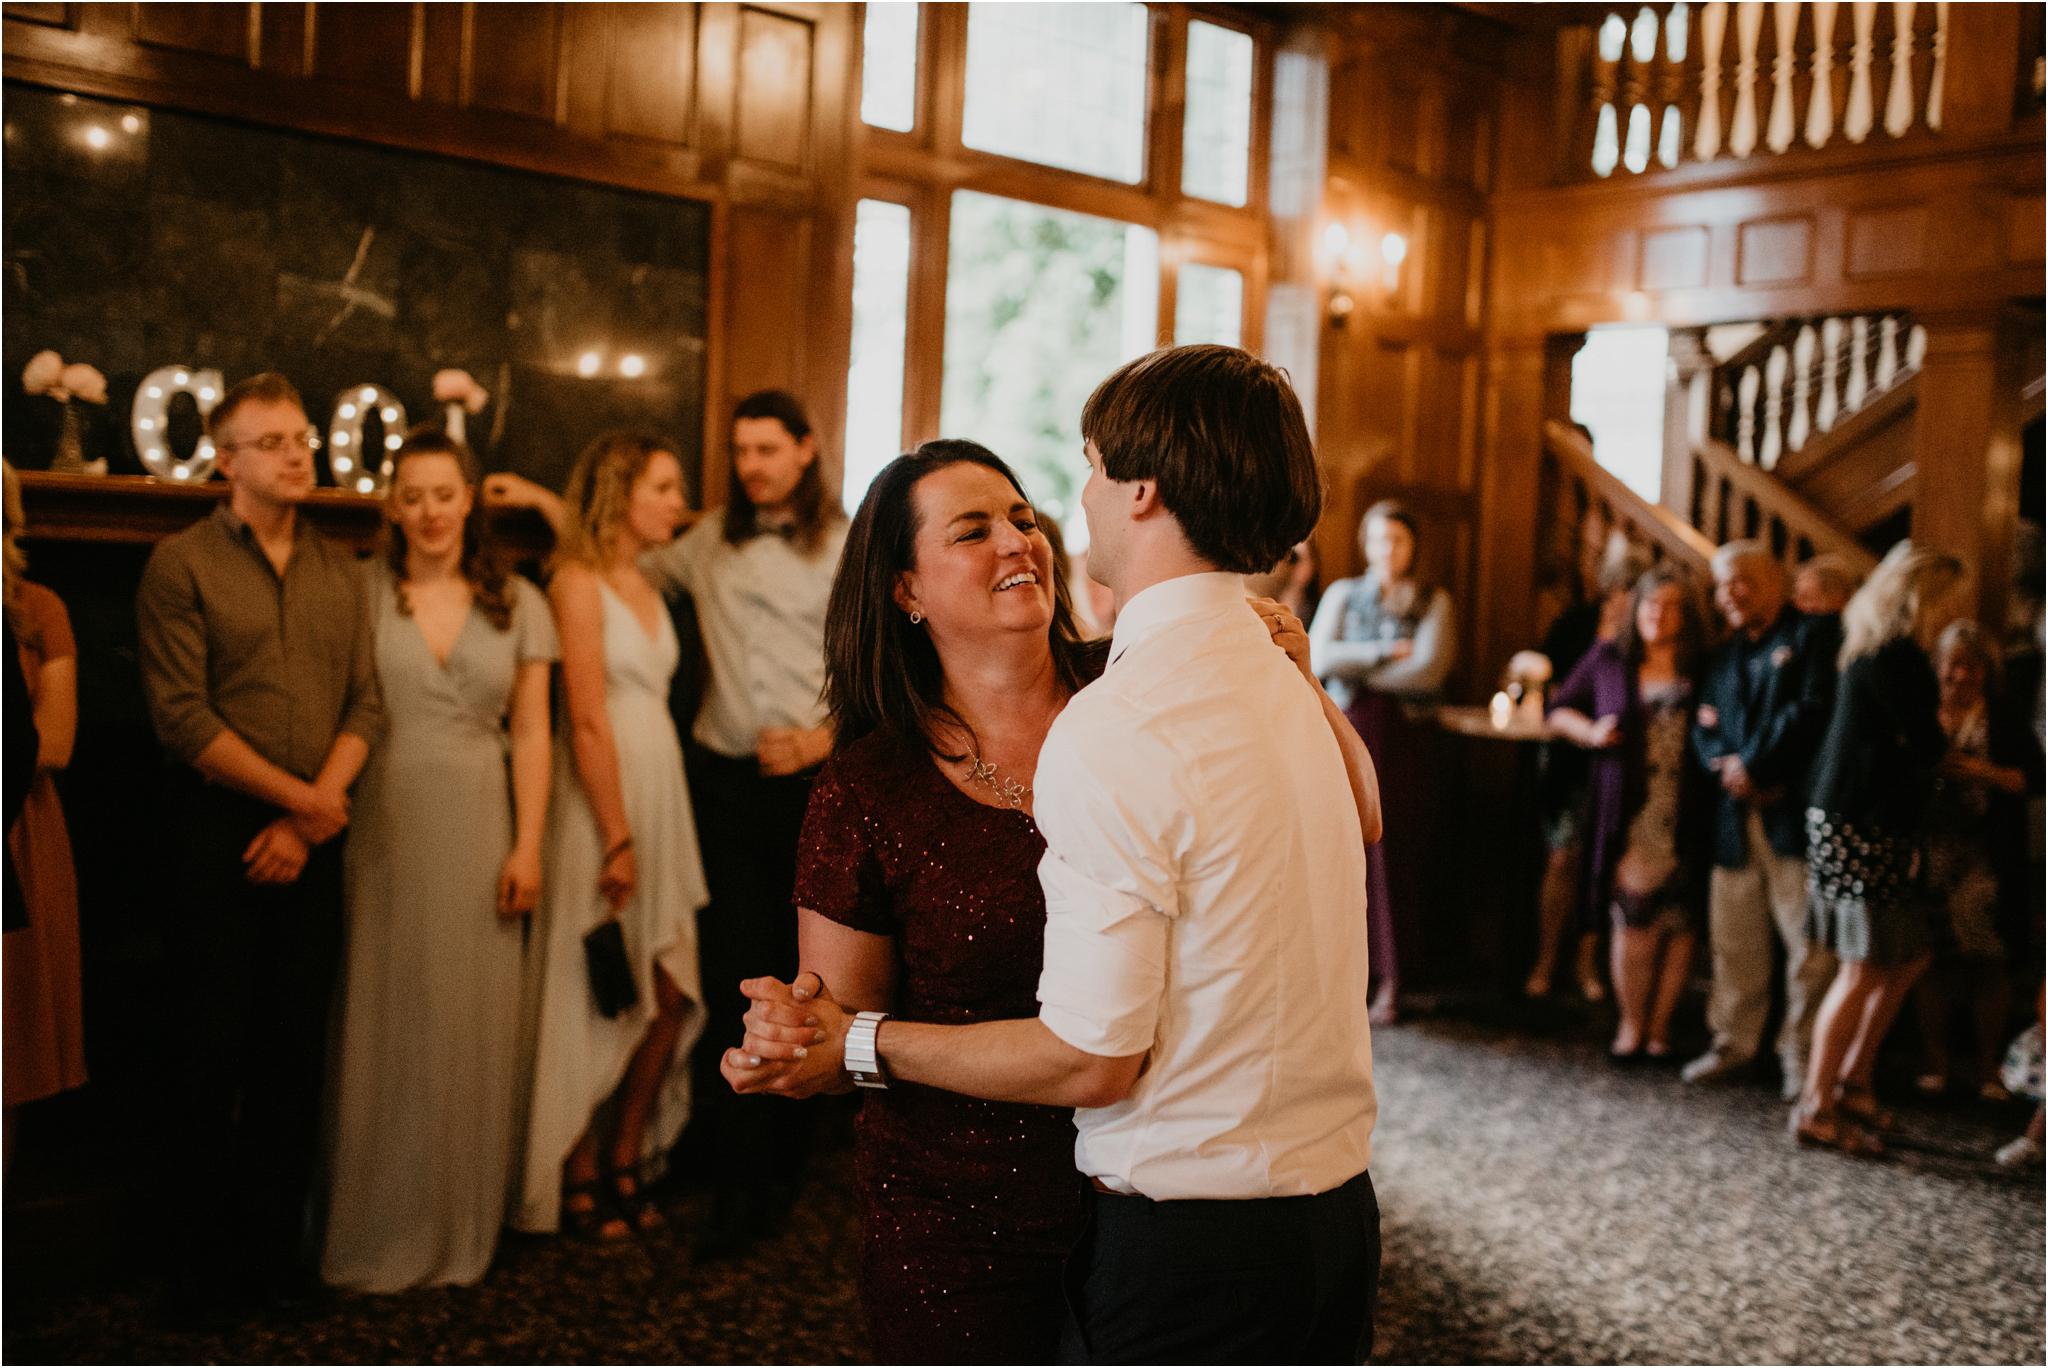 chance-and-ondrea-lairmont-manor-wedding-seattle-photographer-136.jpg